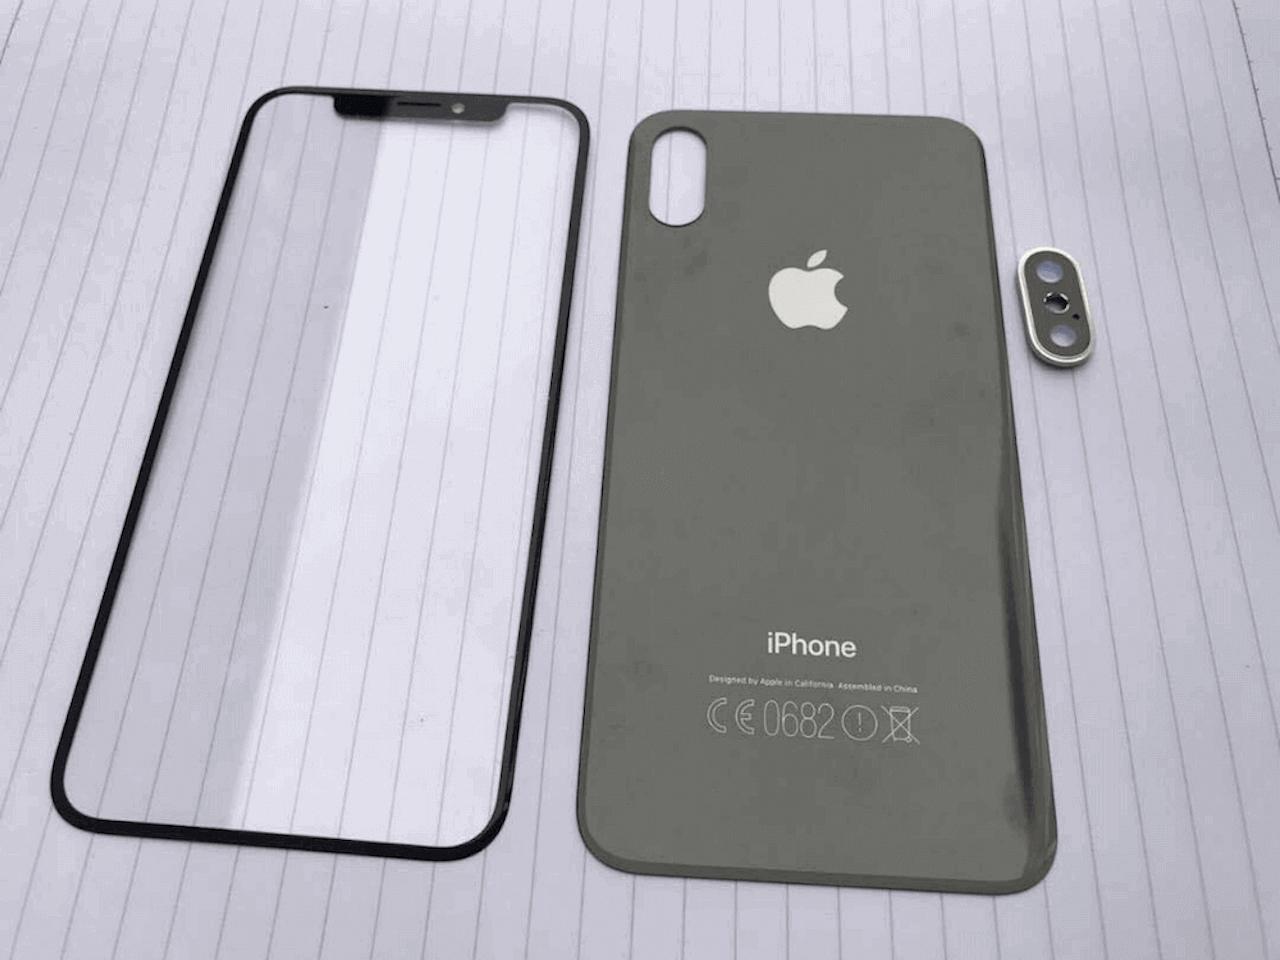 iPhone 8 se filtra por primera vez